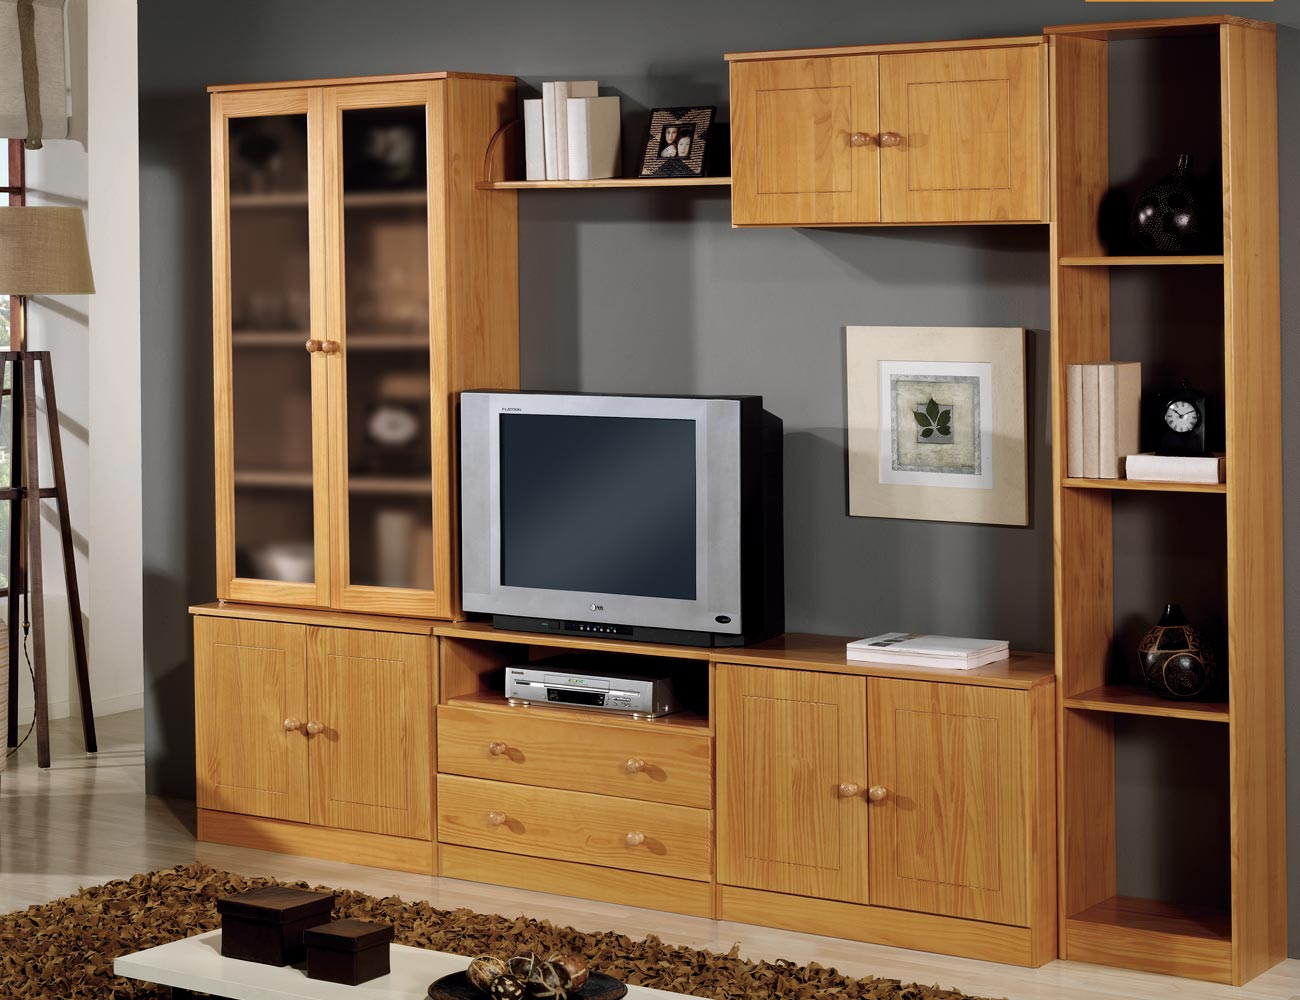 Muebles de sal n comedor en madera de pino color miel - Muebles madera de pino ...